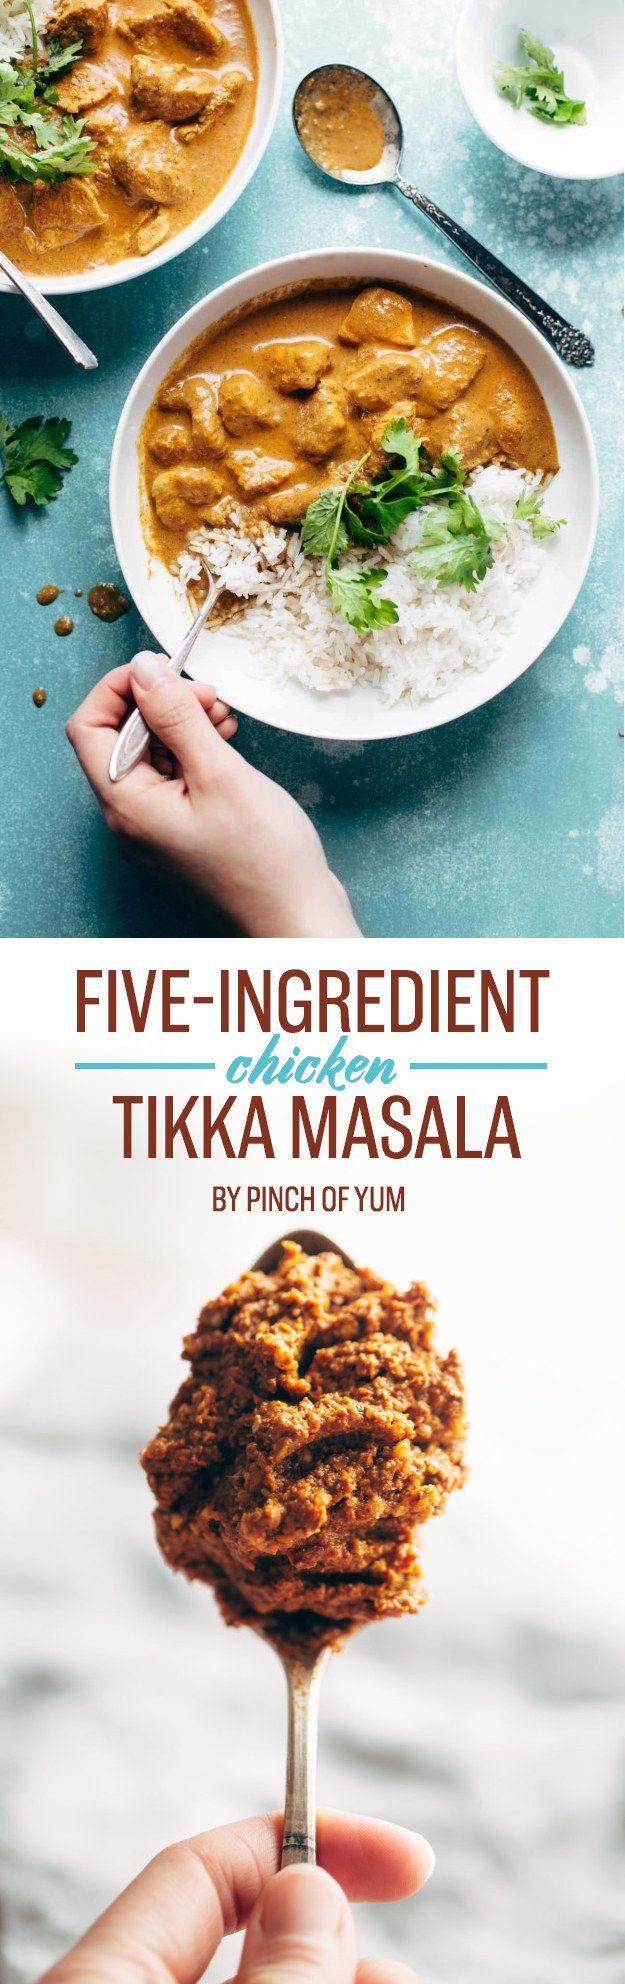 Five-Ingredient Chicken Tikka Masala | 7 Easy Summer Dinners To Eat This Week